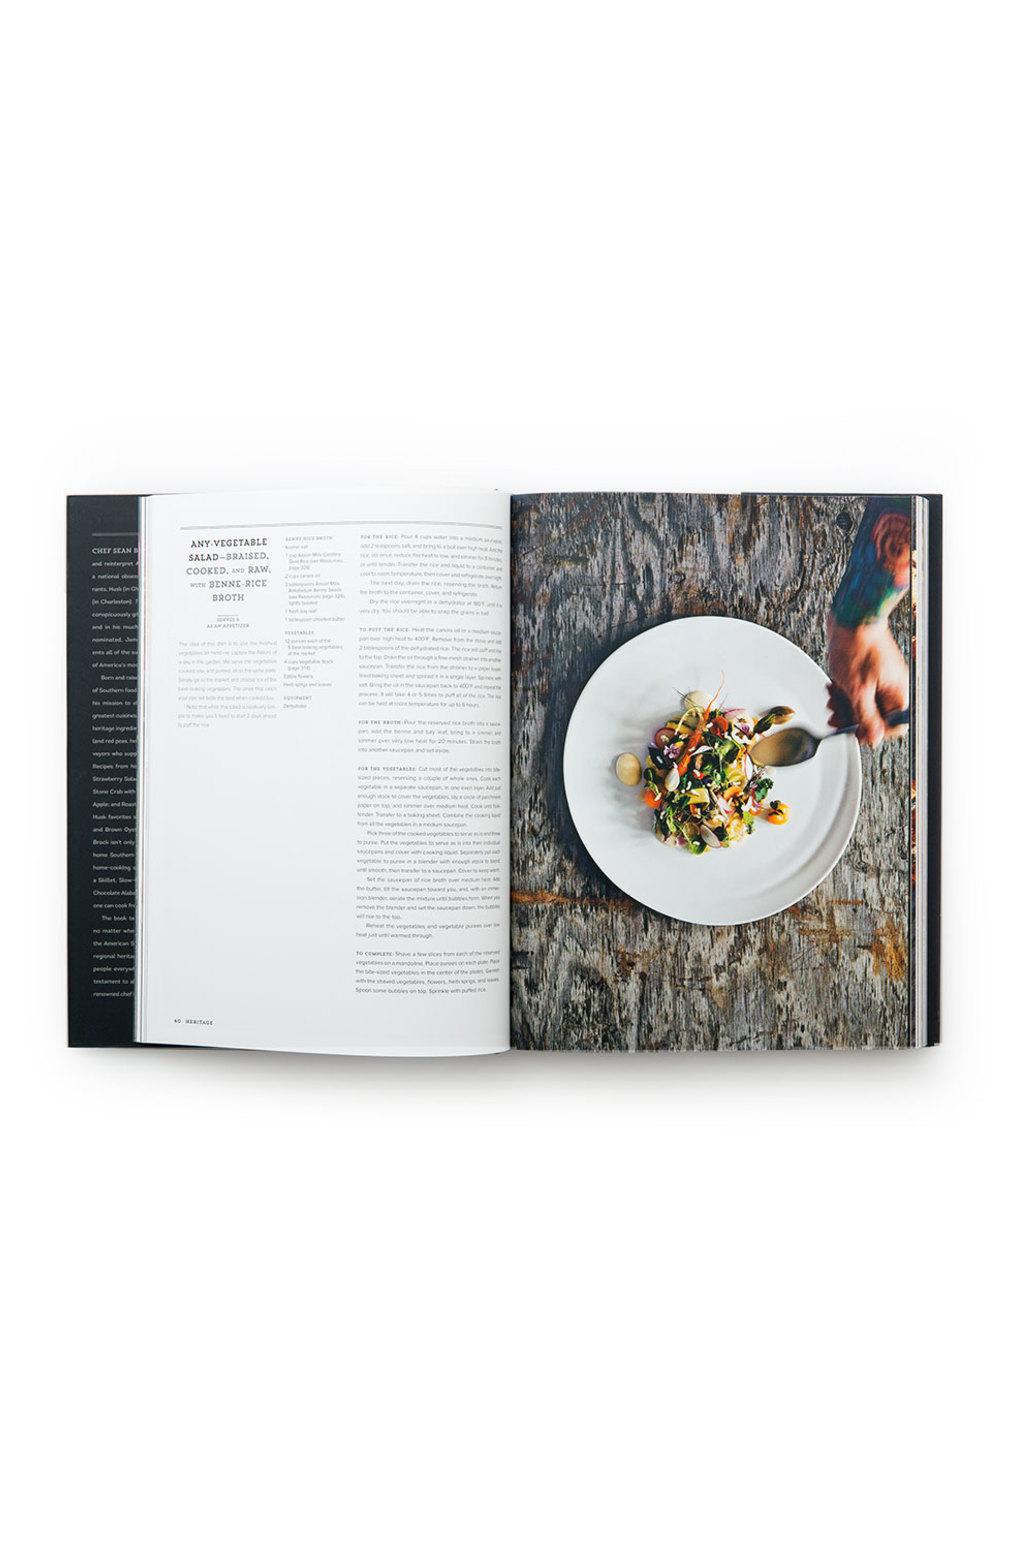 Alabama chanin heritage cookbook by sean brock 2